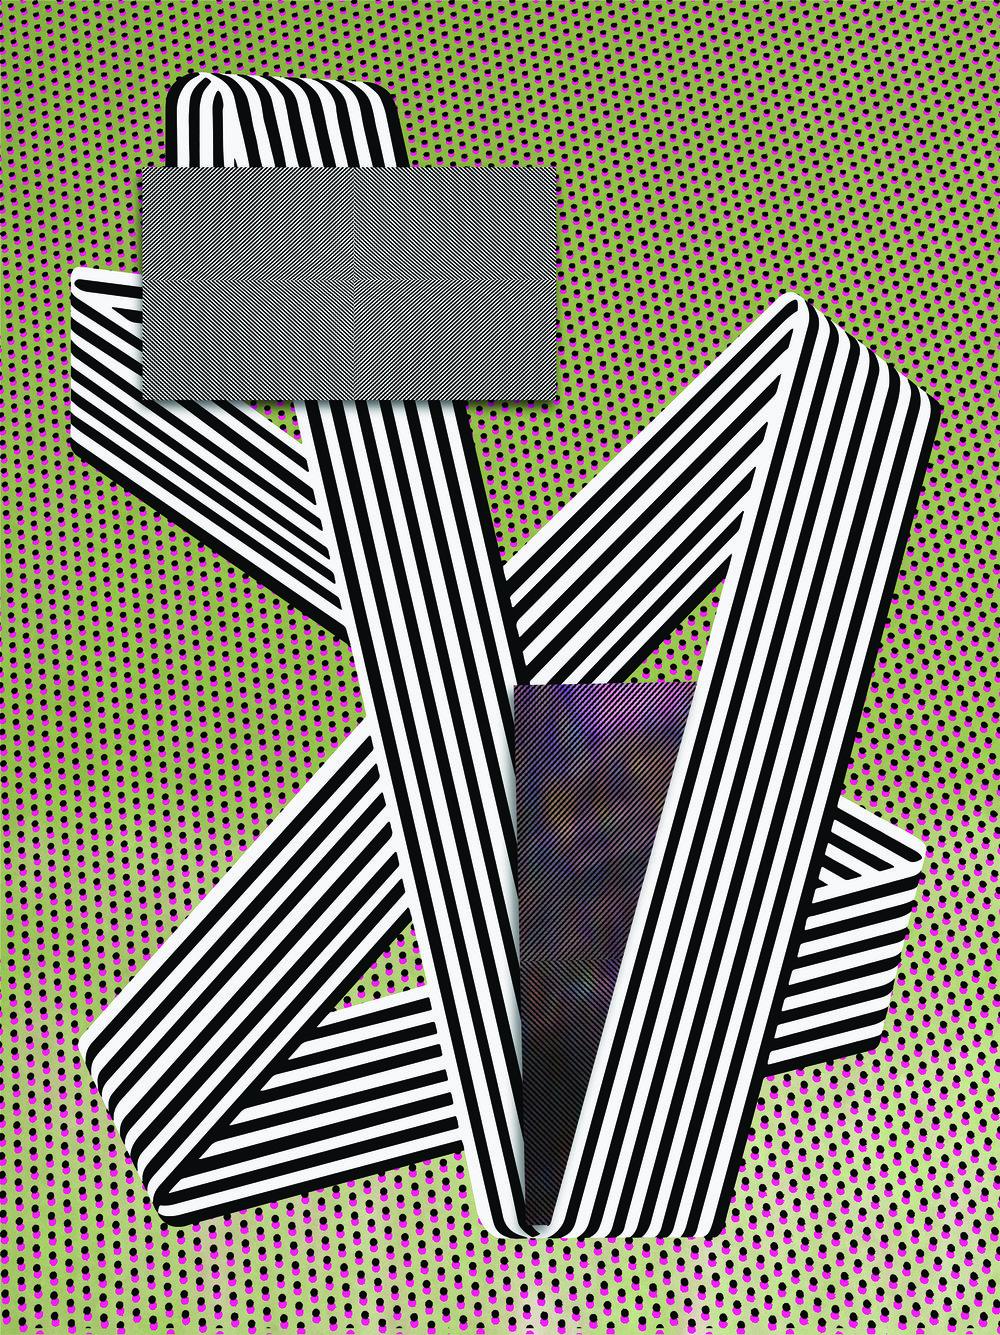 BanffSuite_DoubleDots.jpg